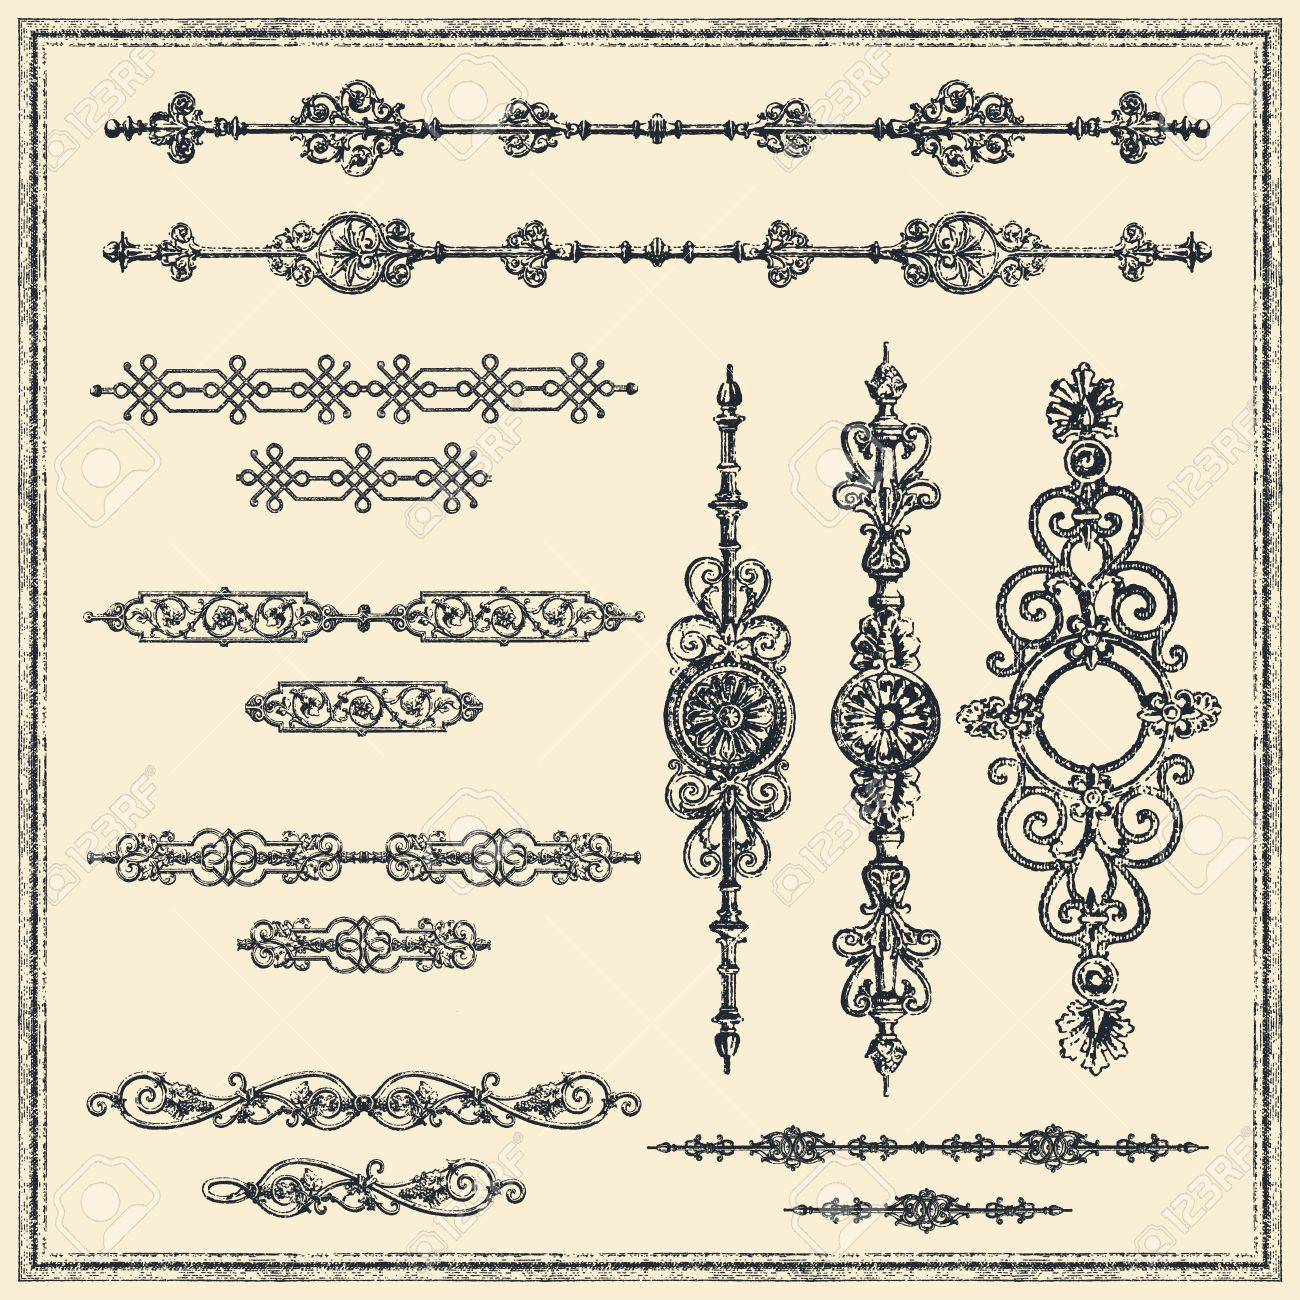 Set of vector vintage-style design elements. - 15647937